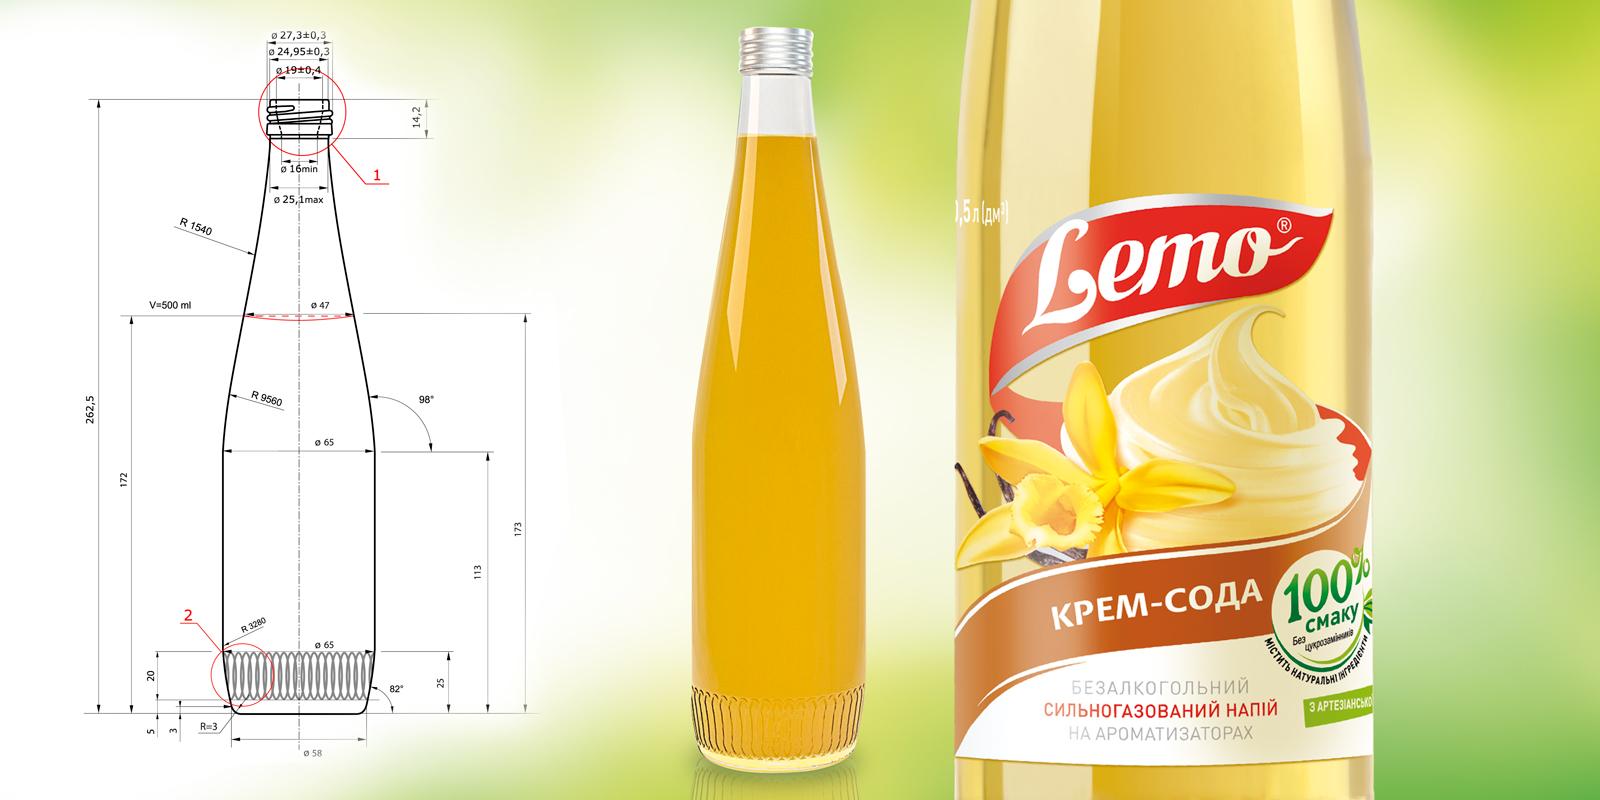 TM Lemo;;;;;;Разработка дизайна бутылки;;;;;;<span>Клиент:</span> TM Lemo;;;;;;;;;;;;Разработка дизайна бутылки;;;;;;7